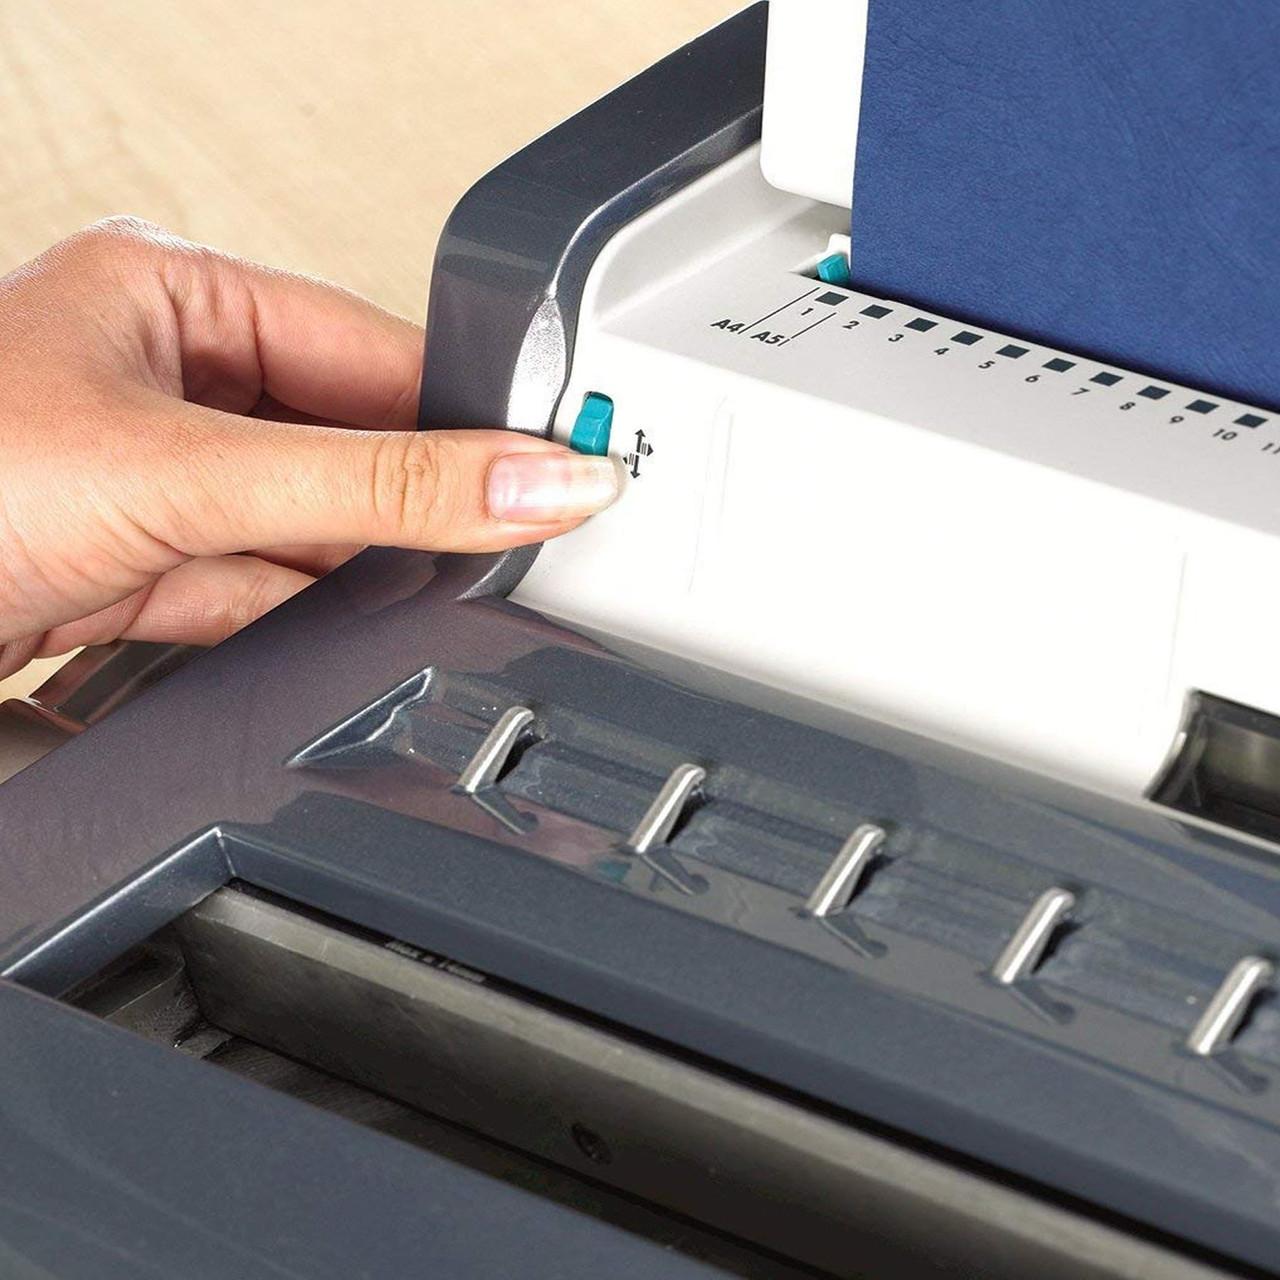 Fellowes 15 Sheet Punch Wire Binding Machine